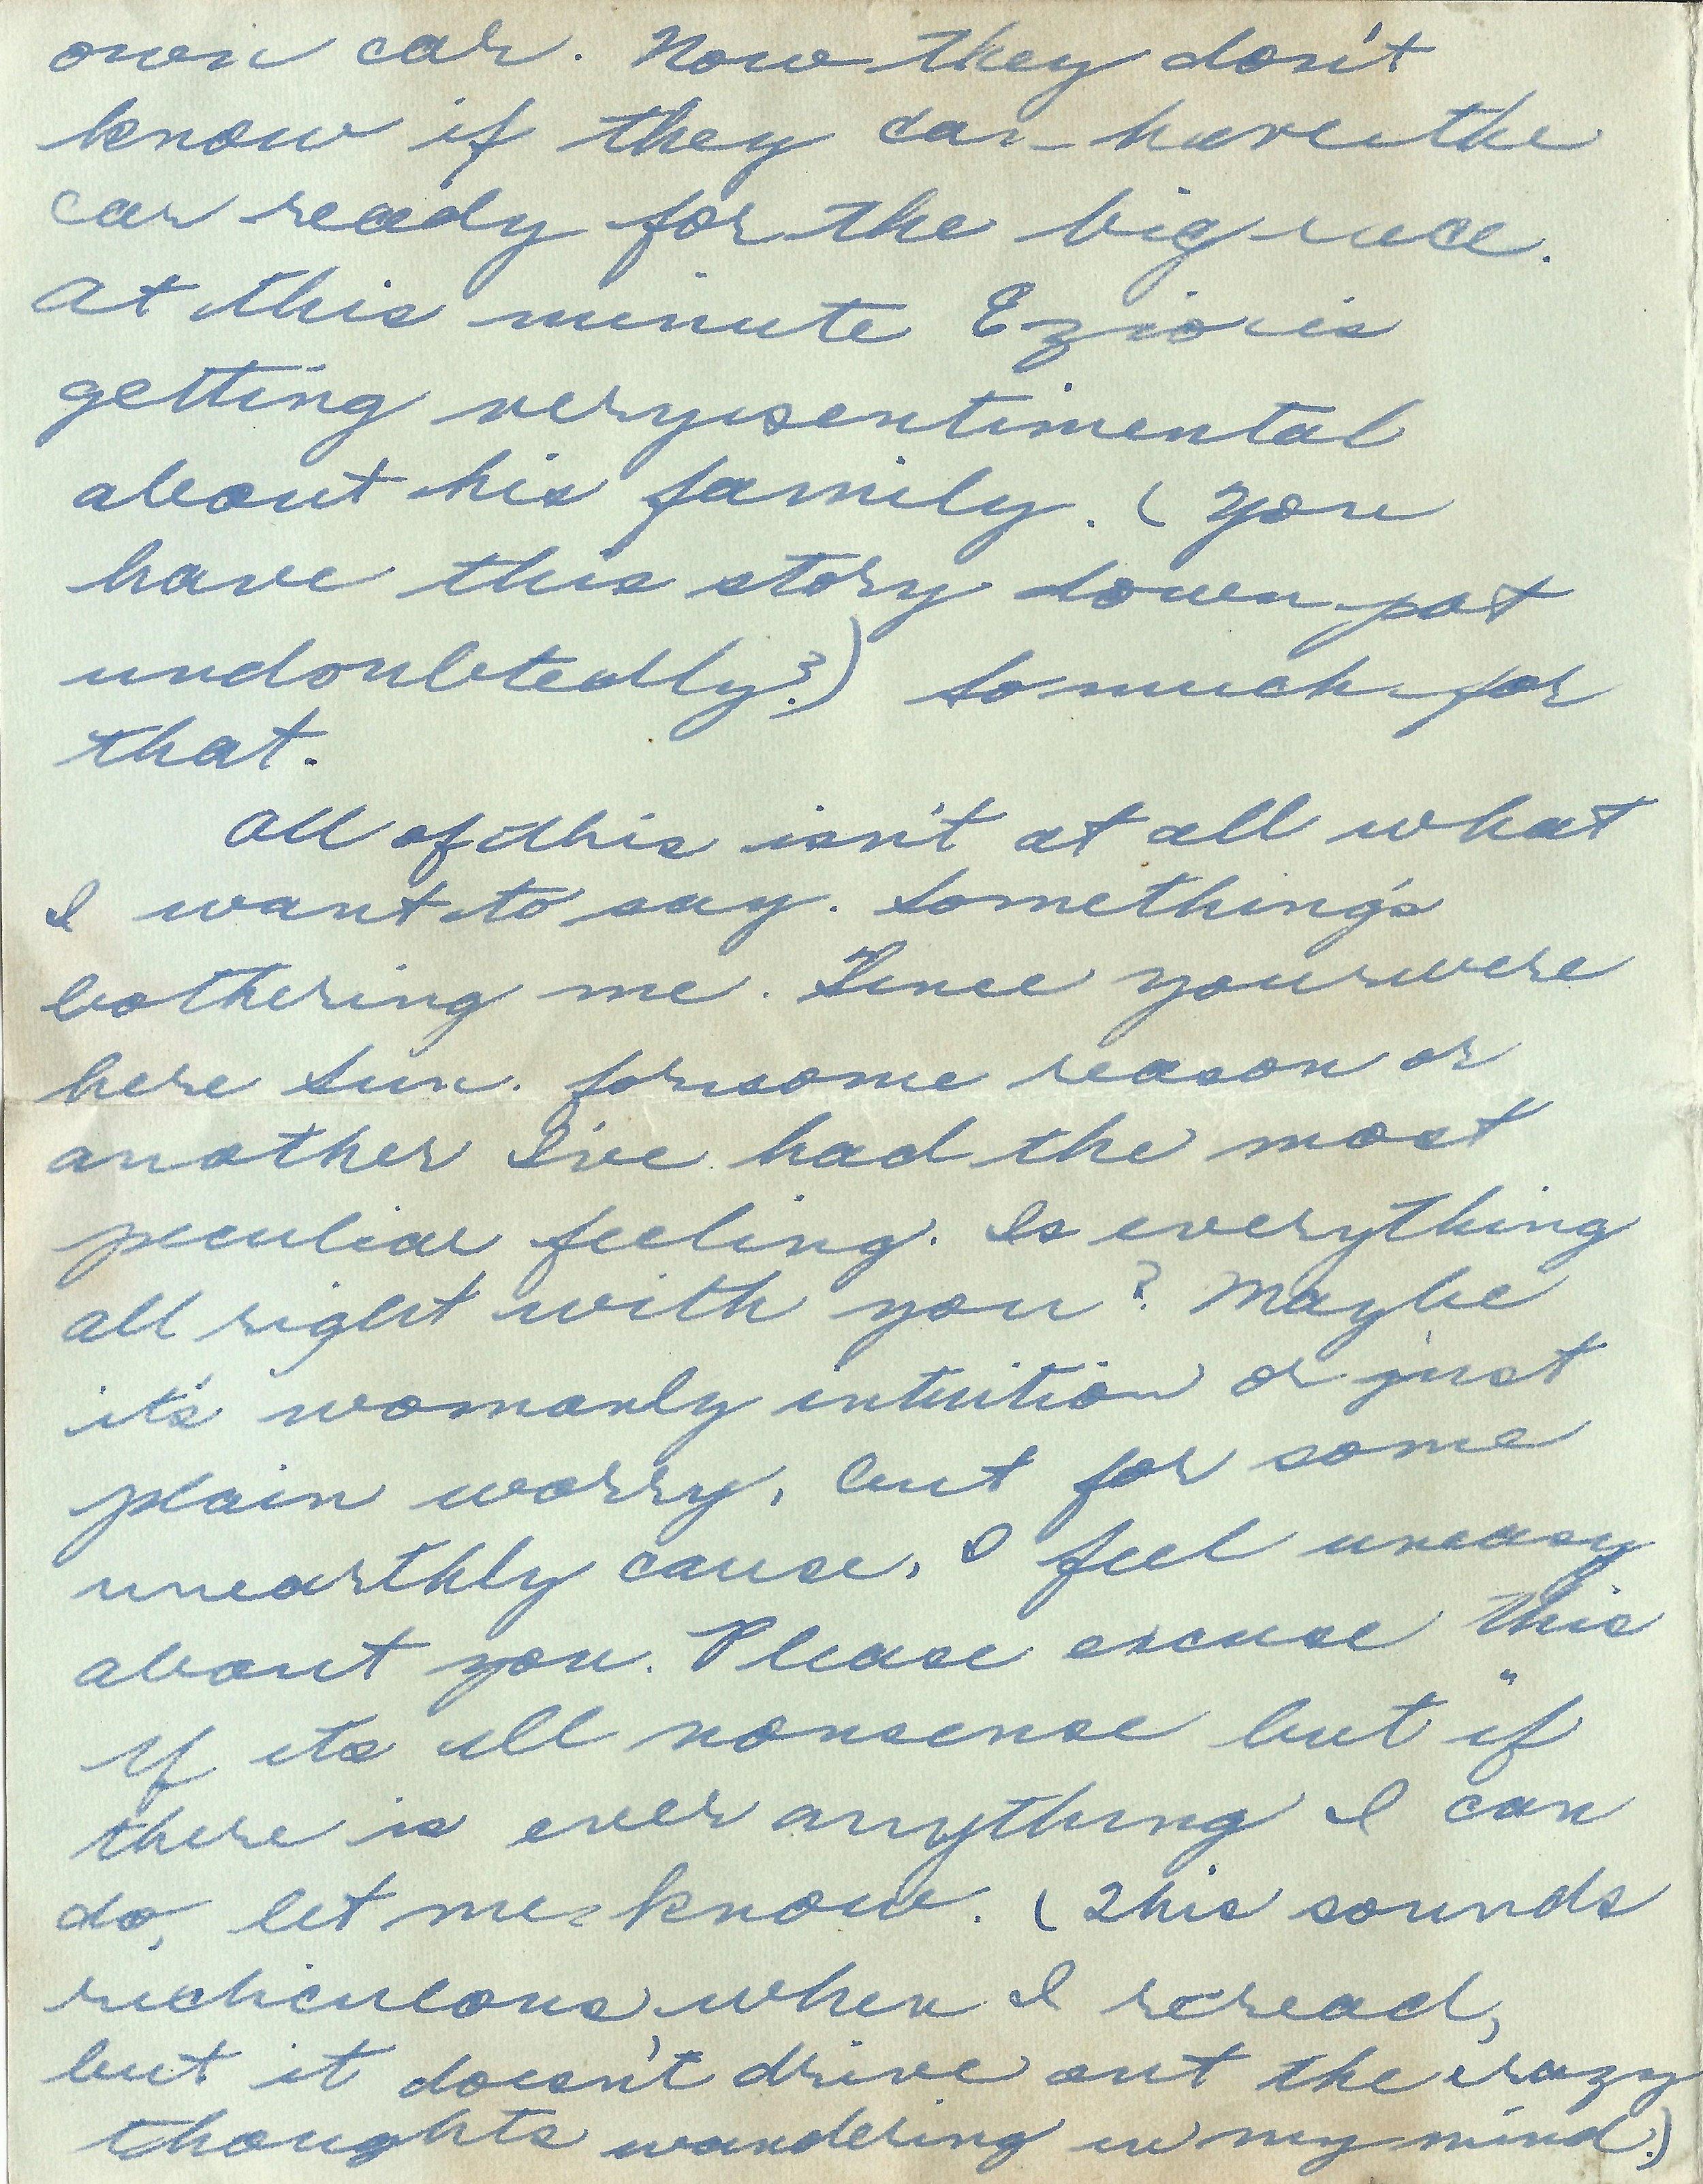 10. Nov. 24, 1952 (Oma)_Page_3 (1).jpg